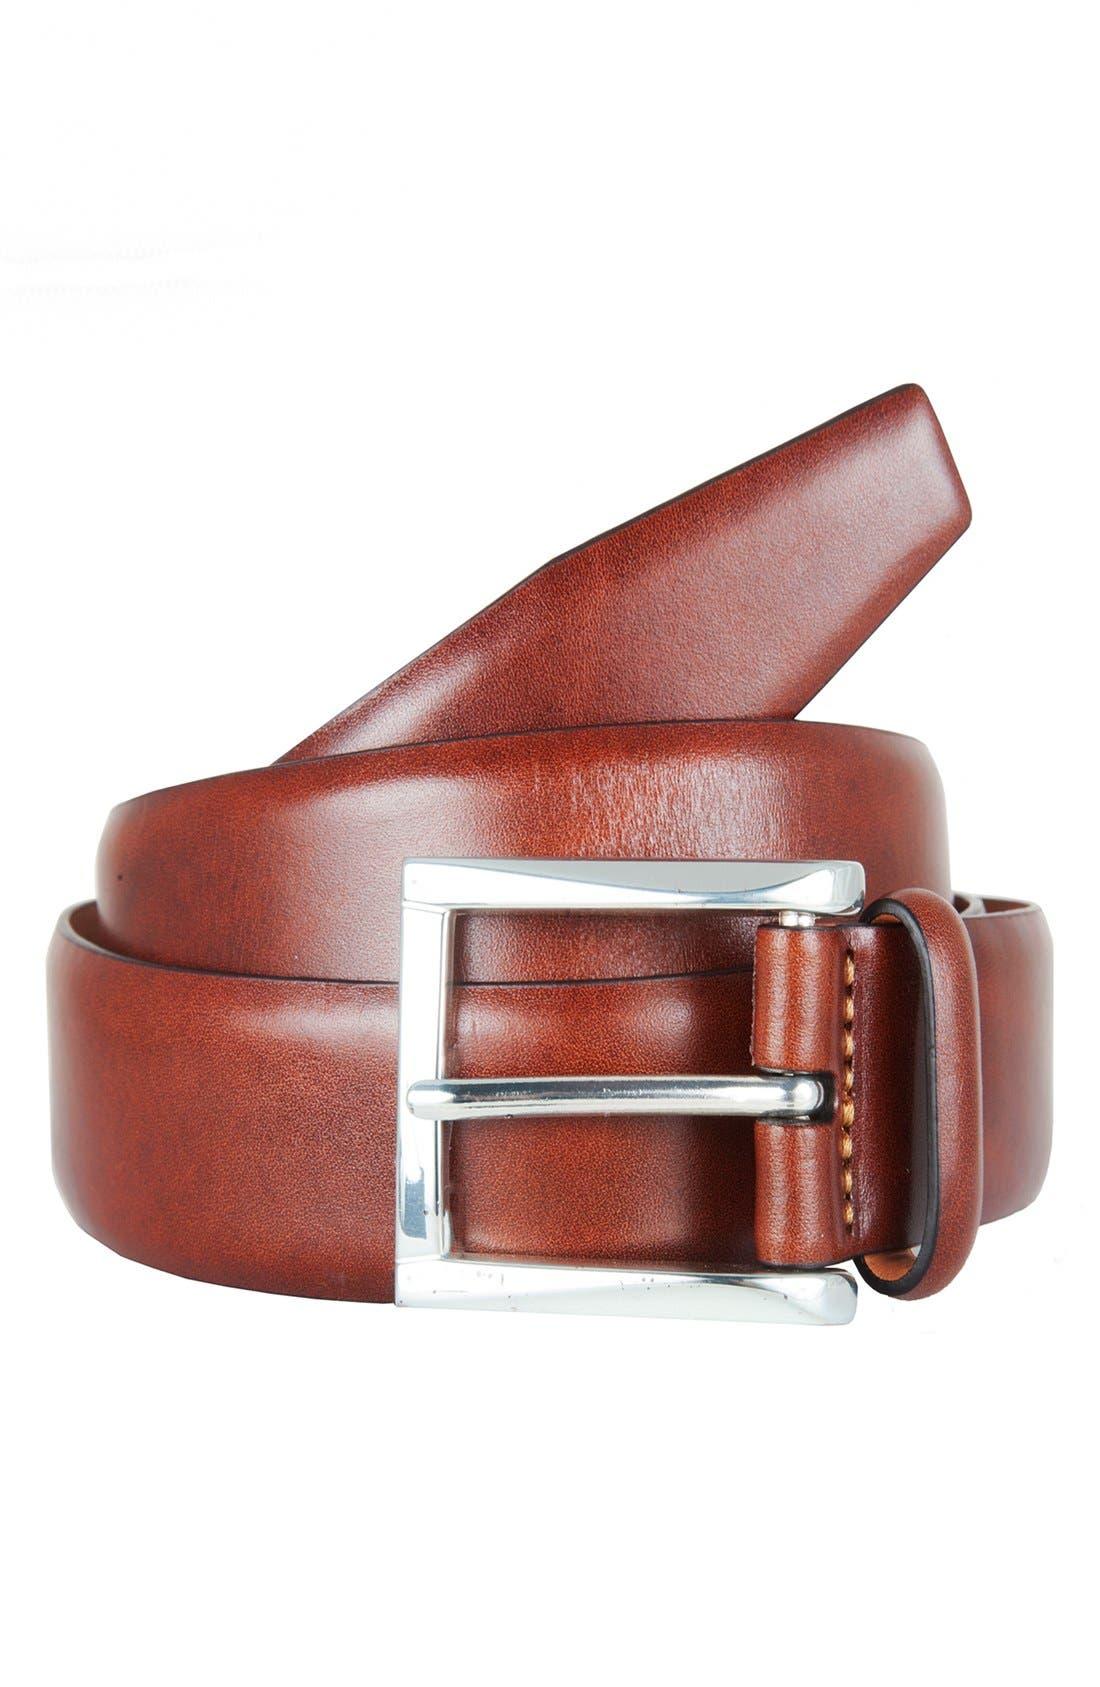 Main Image - Trafalgar 'Broderick' Belt